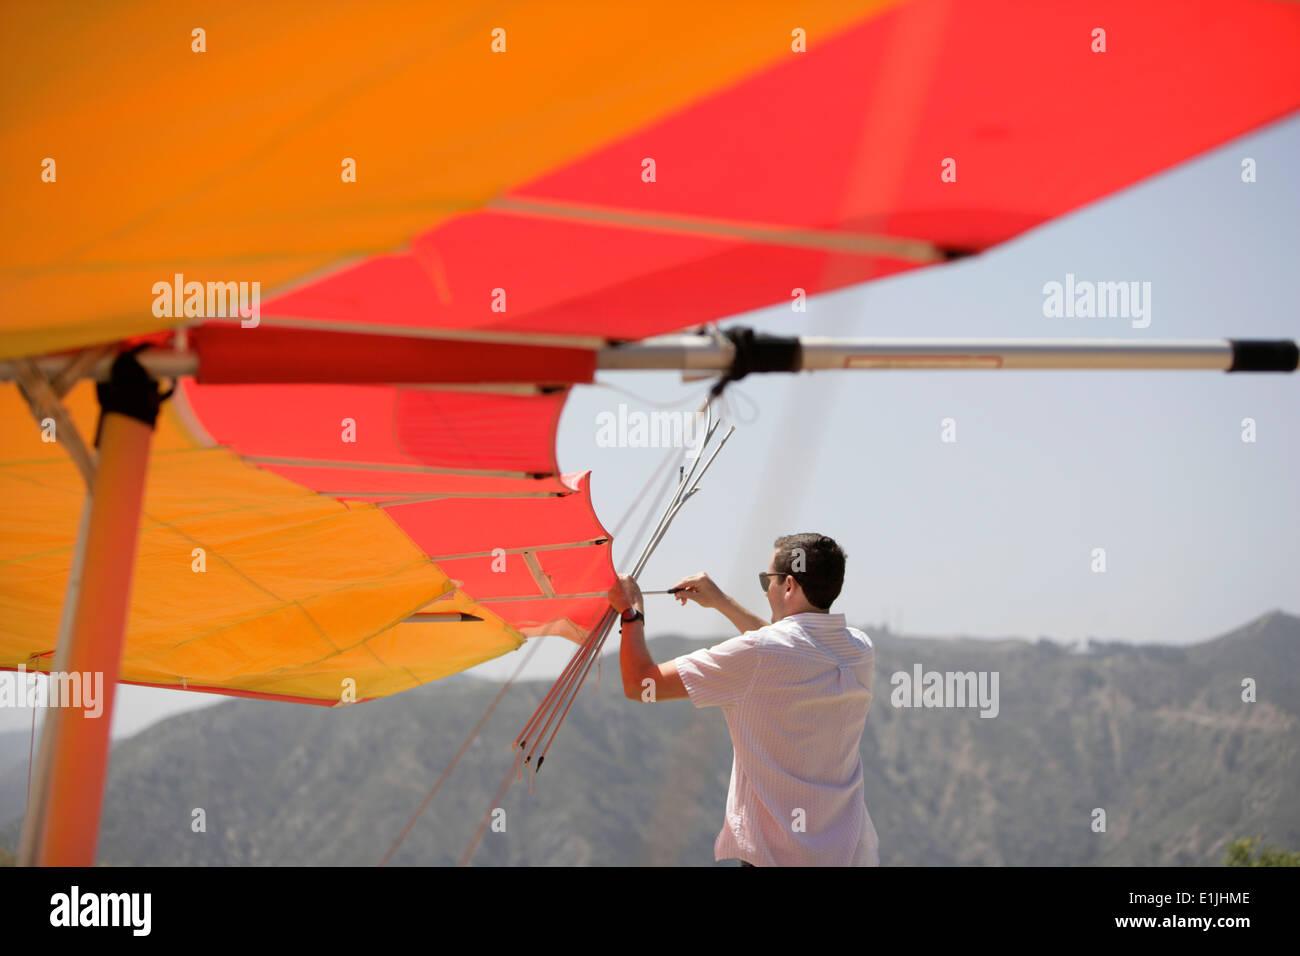 Man repairing hang glider - Stock Image